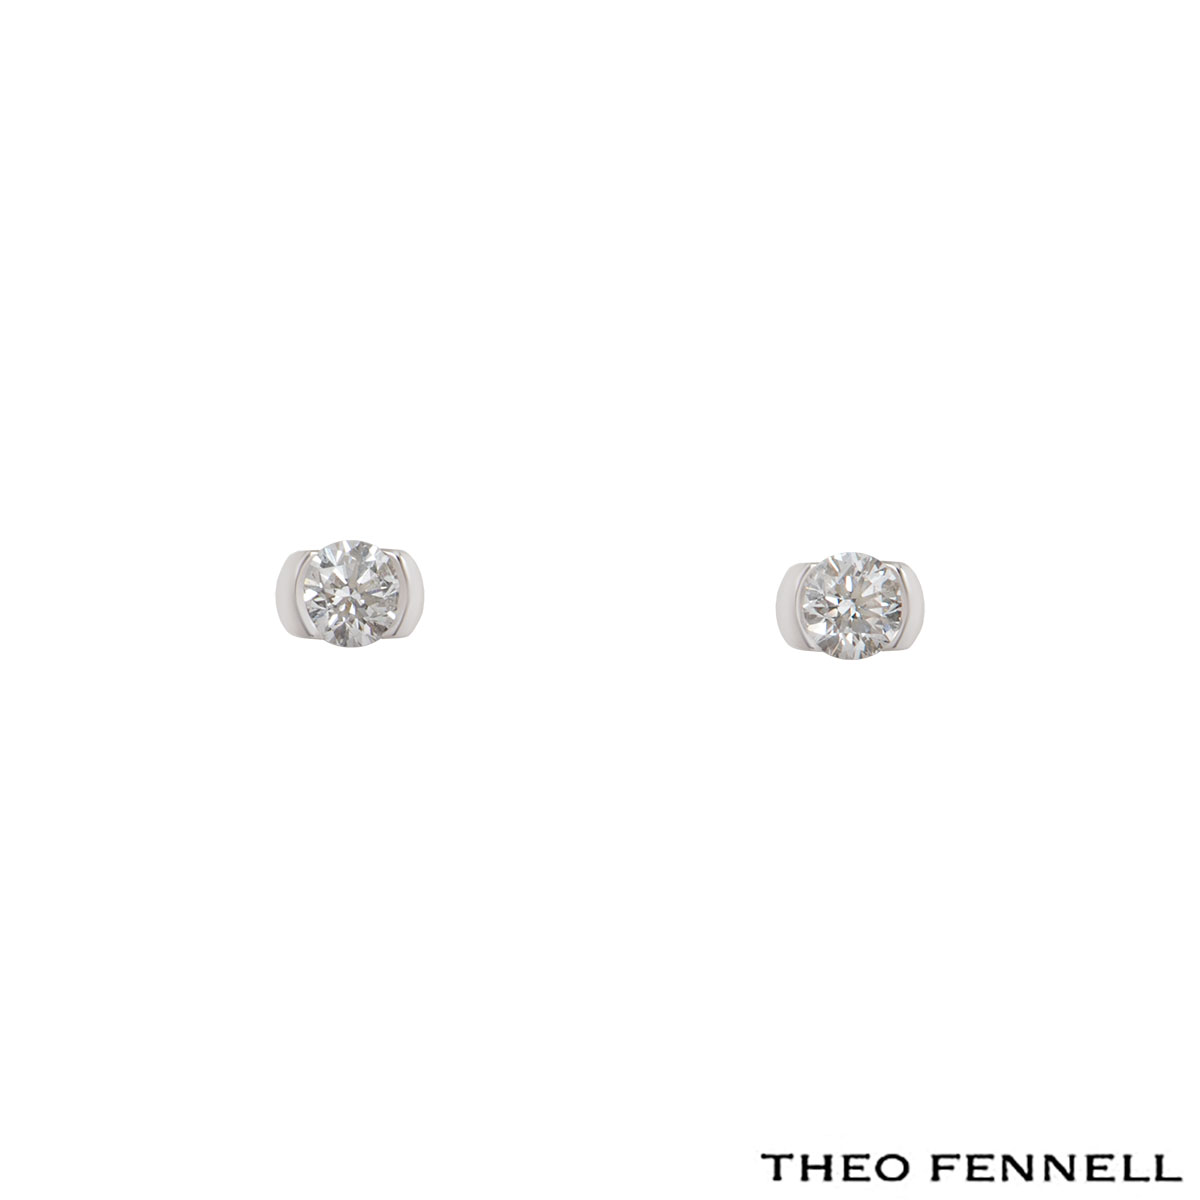 Theo Fennell White Gold Diamond Stud Earrings 0.50ct G/VS1